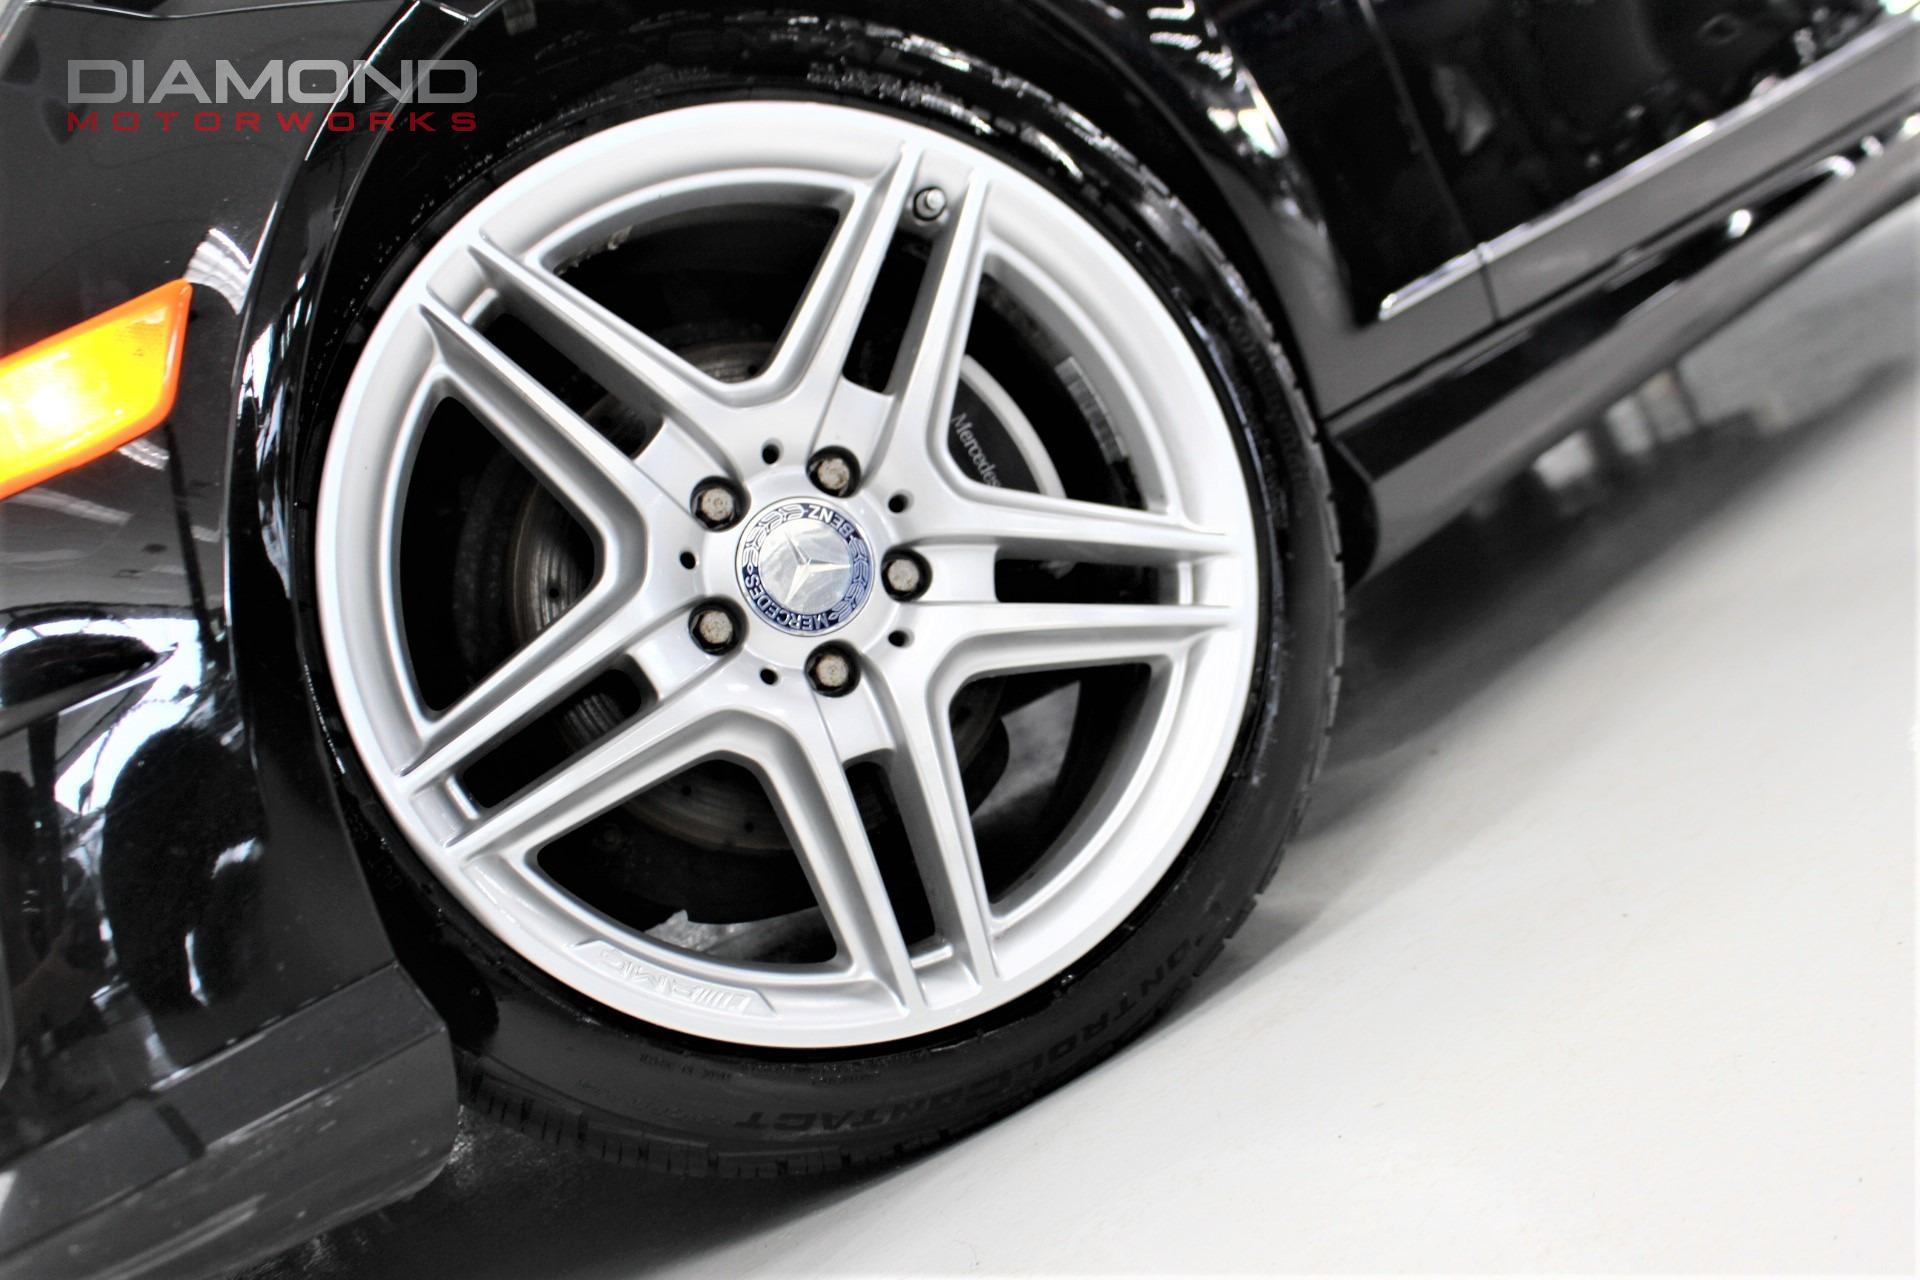 Used-2012-Mercedes-Benz-C-Class-4dr-Sedan-C300-Sport-4MATIC